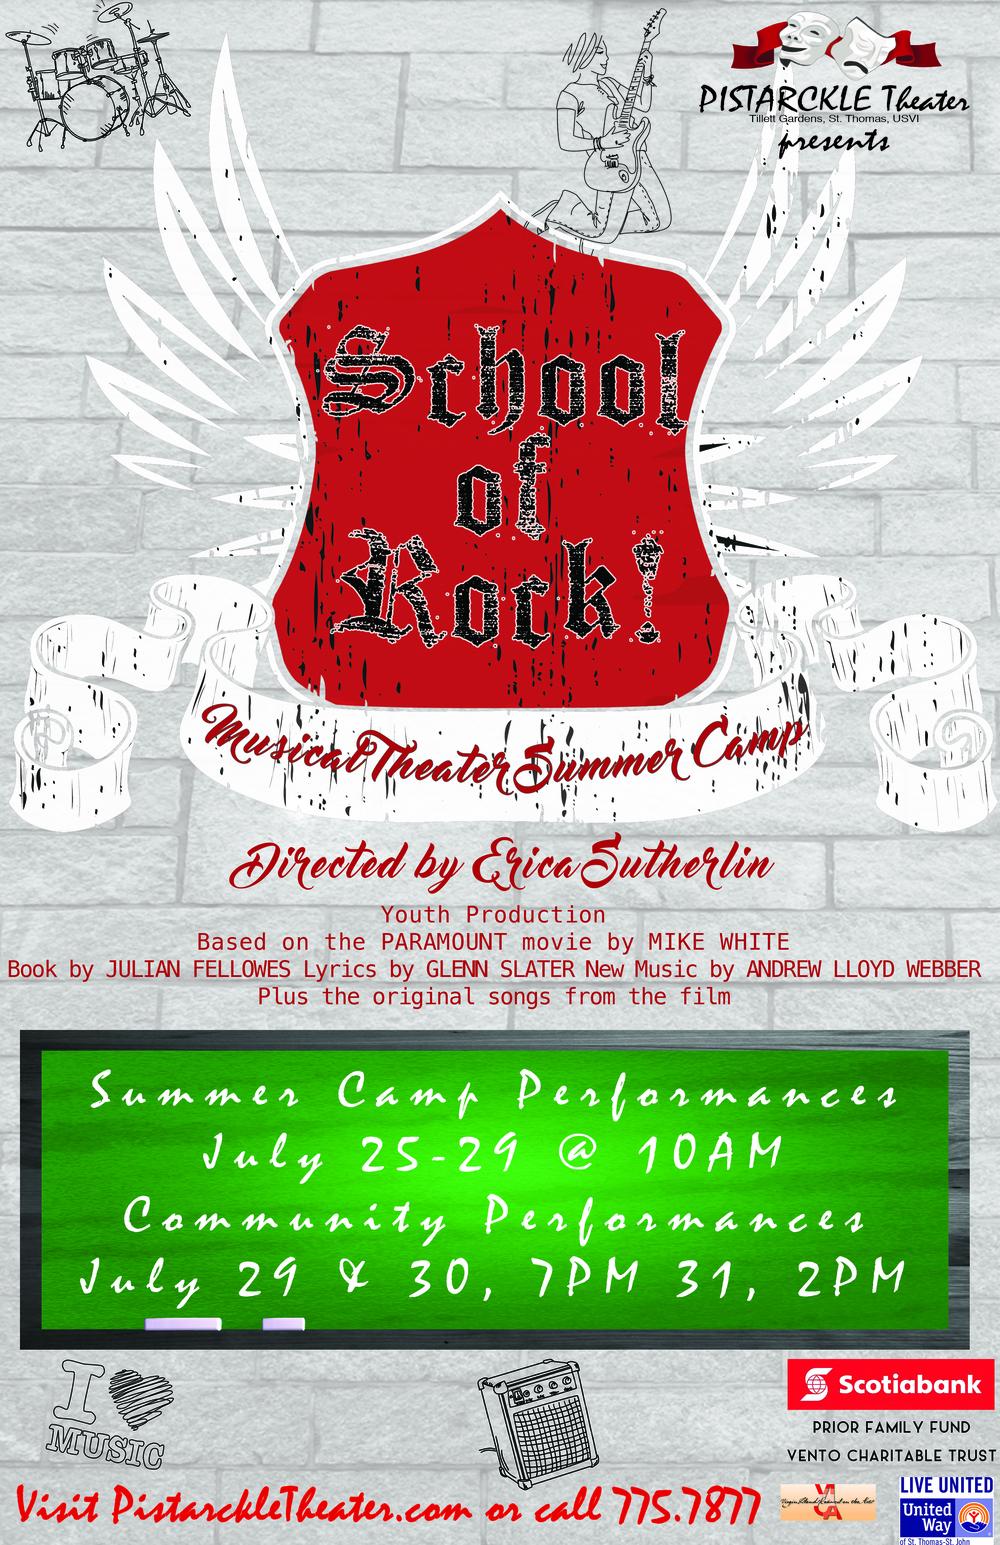 School of Rock - Live Entertainment on St. Thomas, USVI